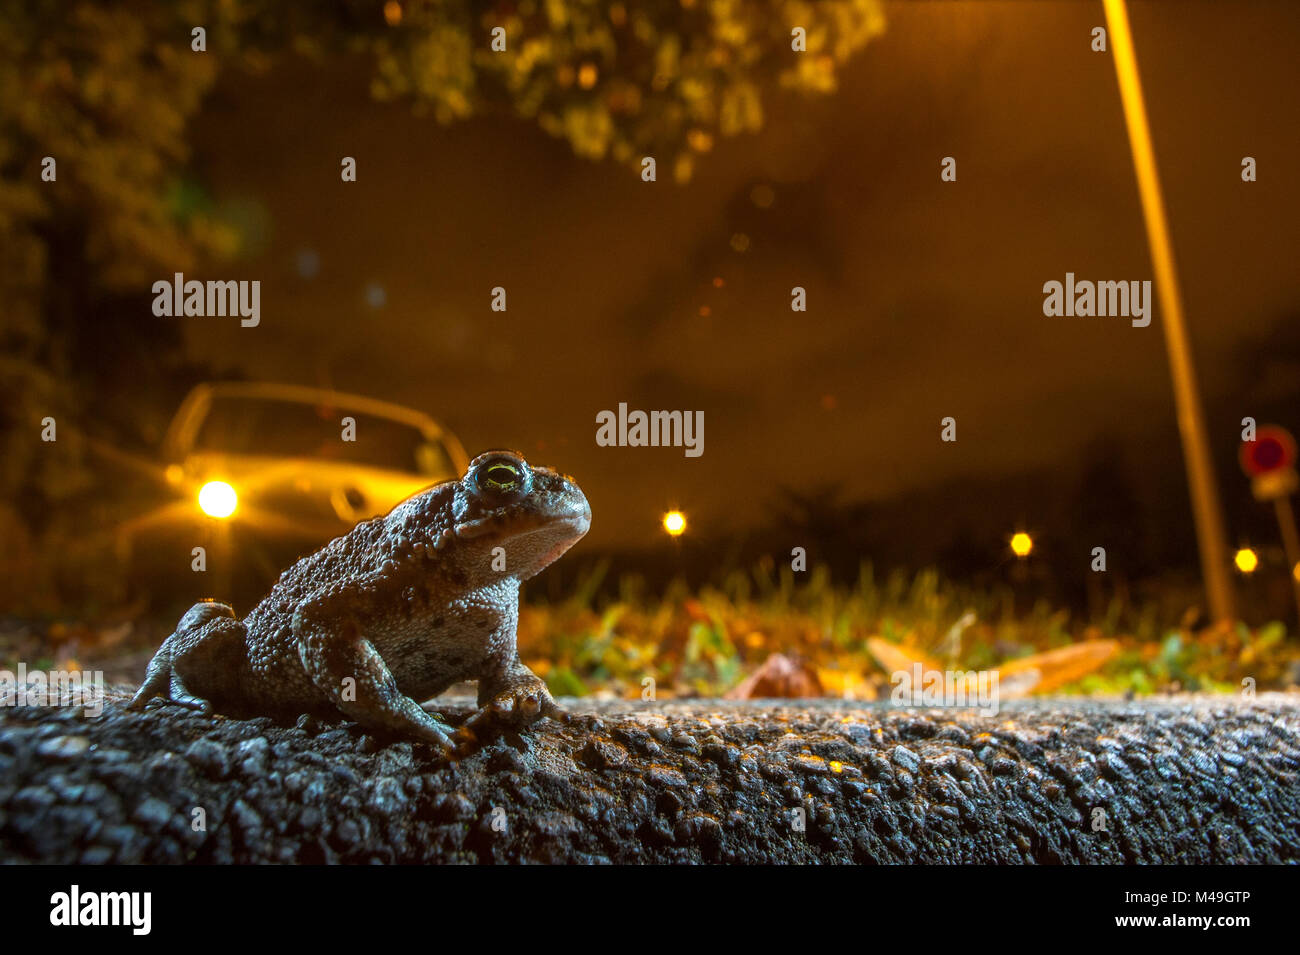 Natterjack (Epidalea calamita) on road at night with car behind, France, September. - Stock Image